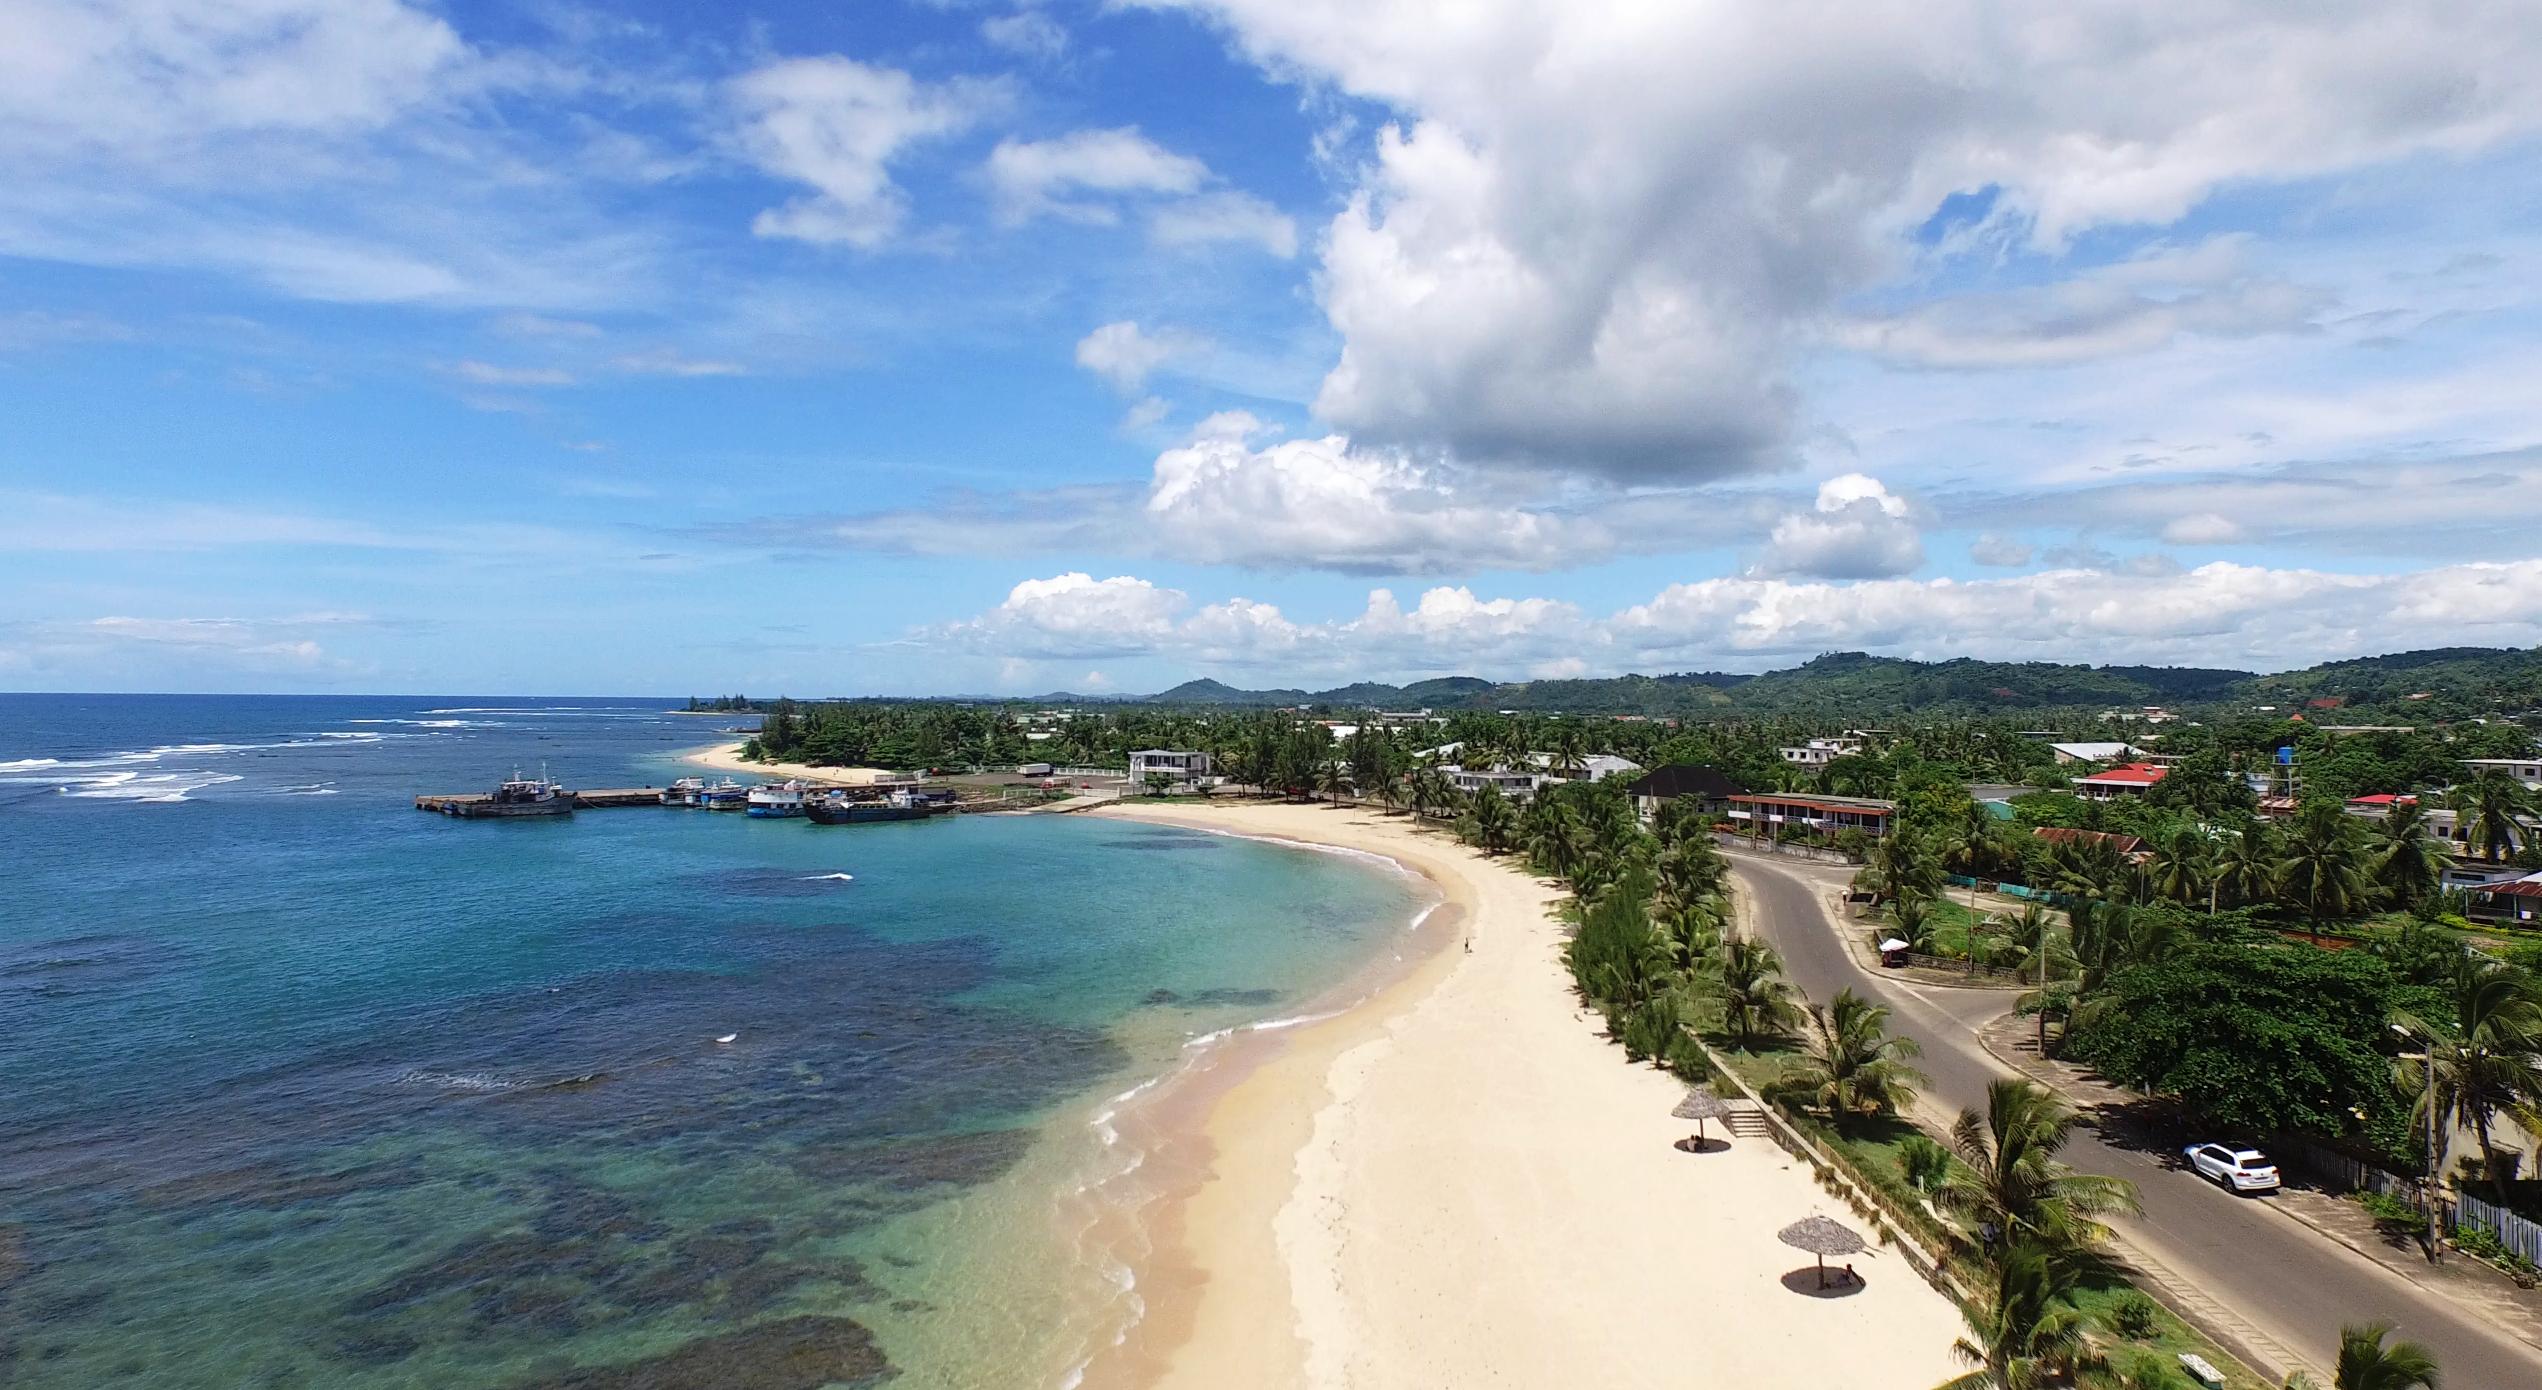 beach view Antalaha